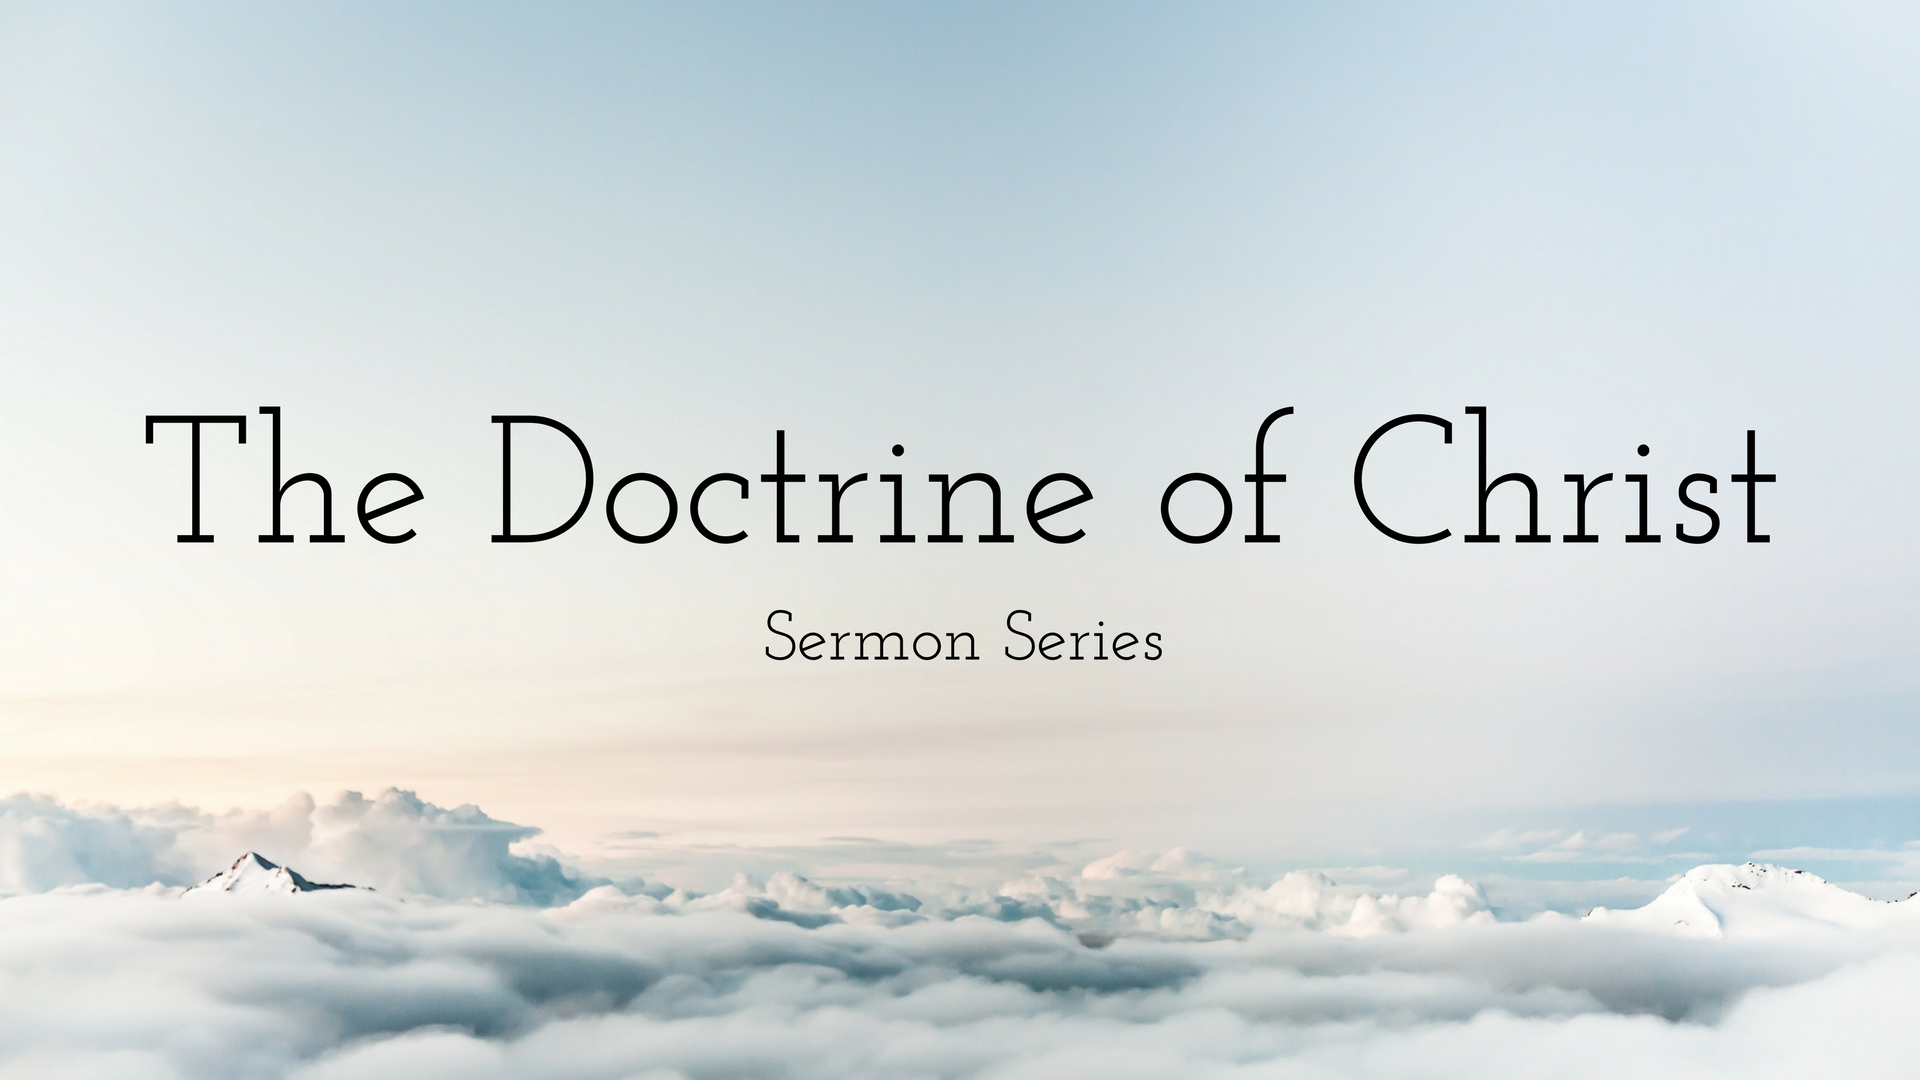 The Doctrine of Christ (1).jpg